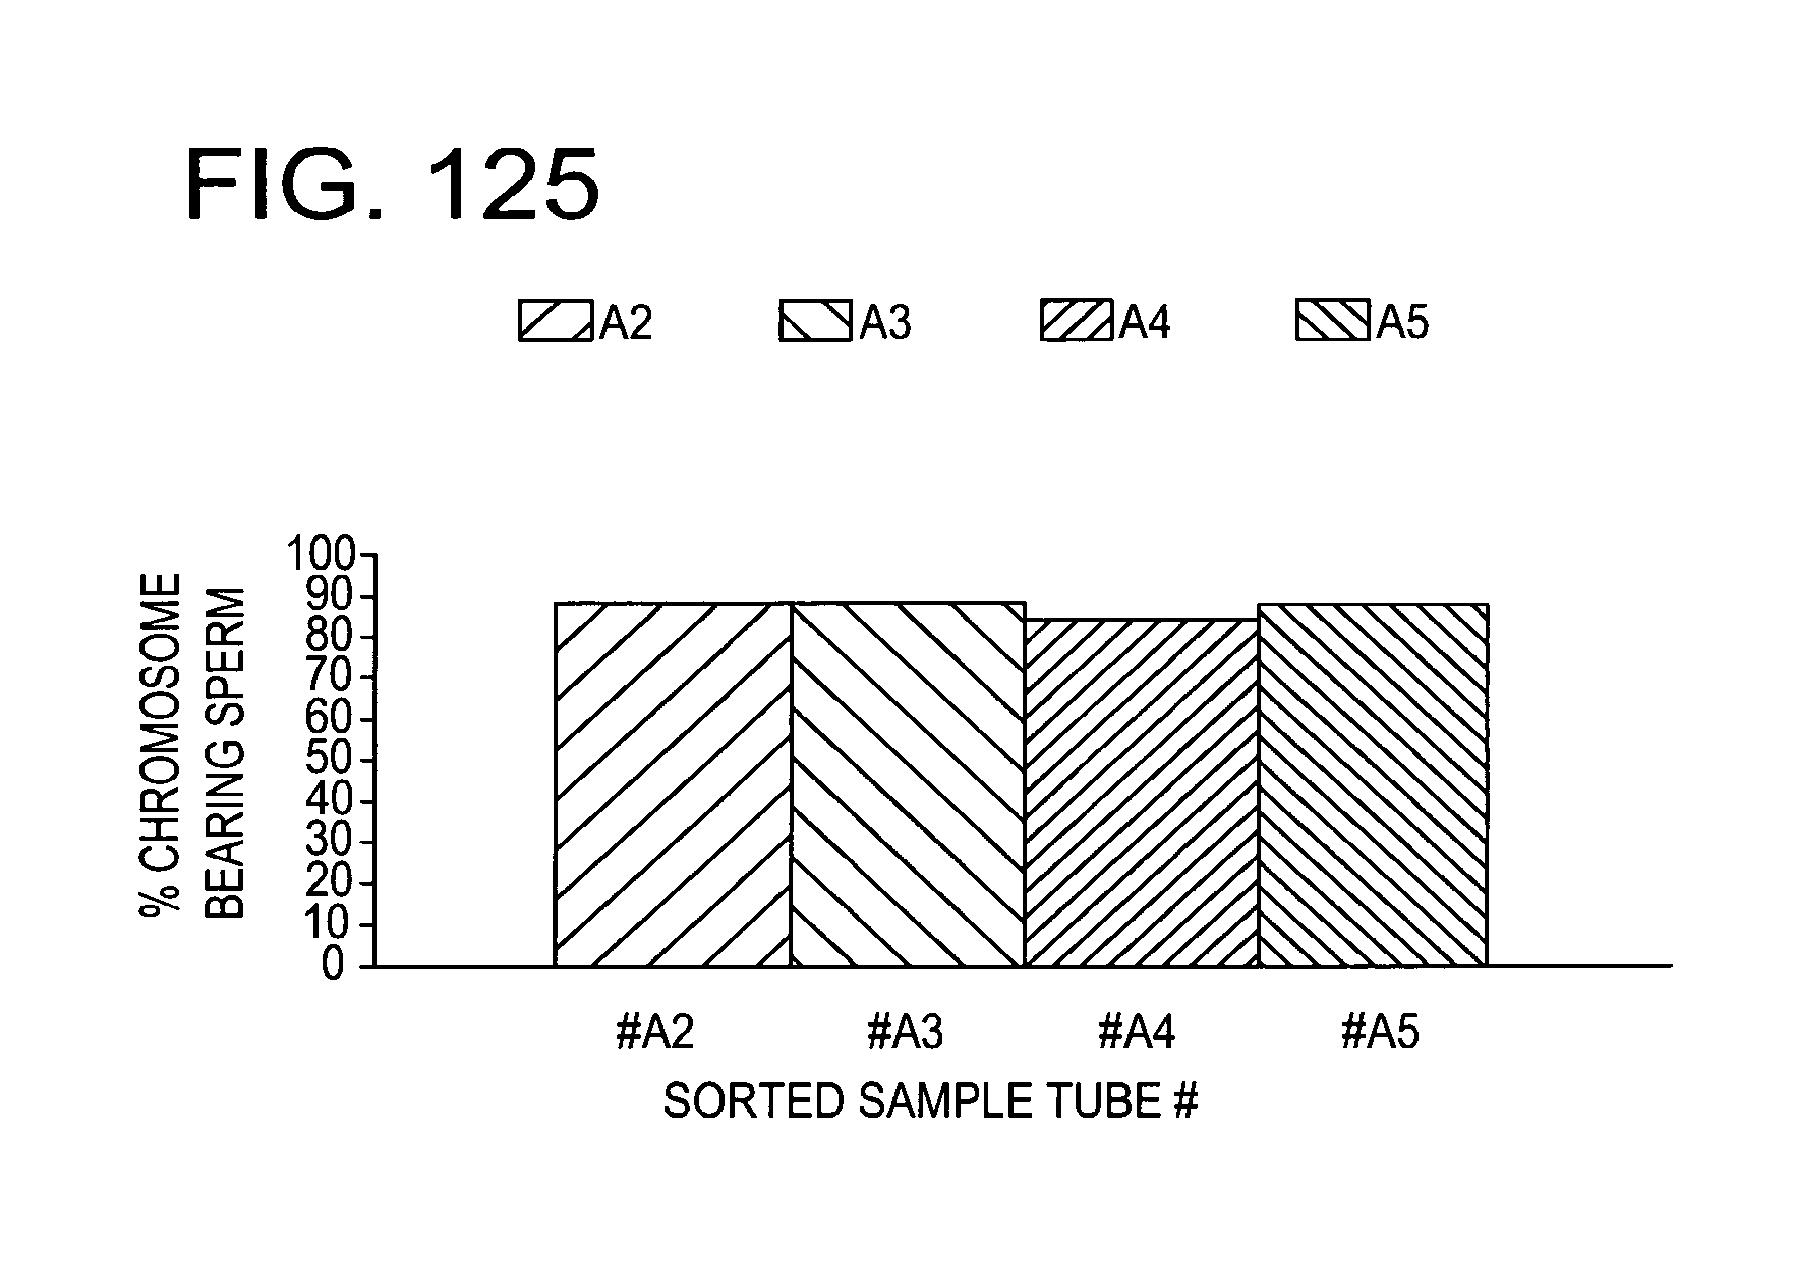 Patent US 8,748,183 B2